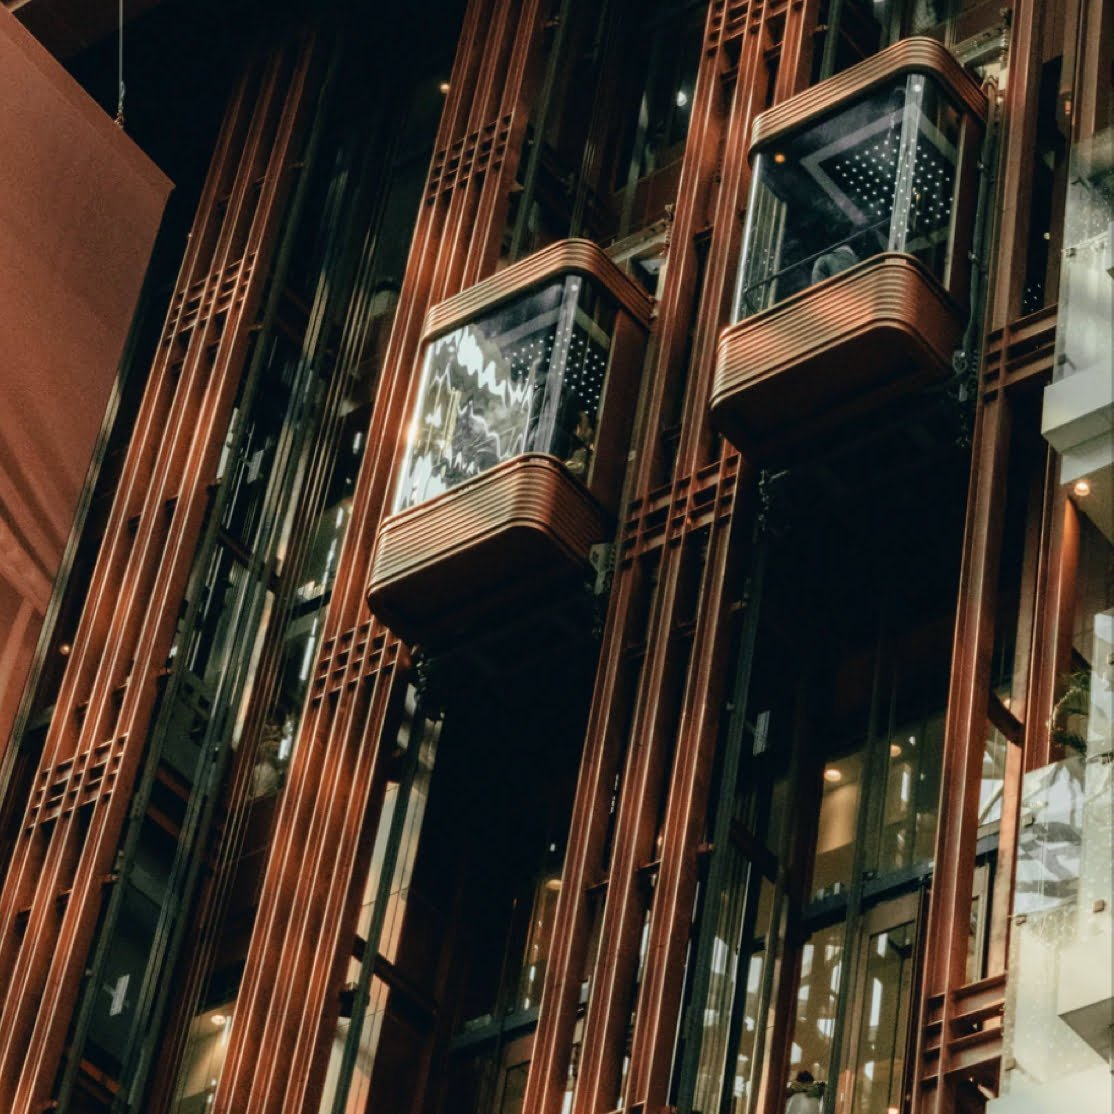 Elevator monitoring service